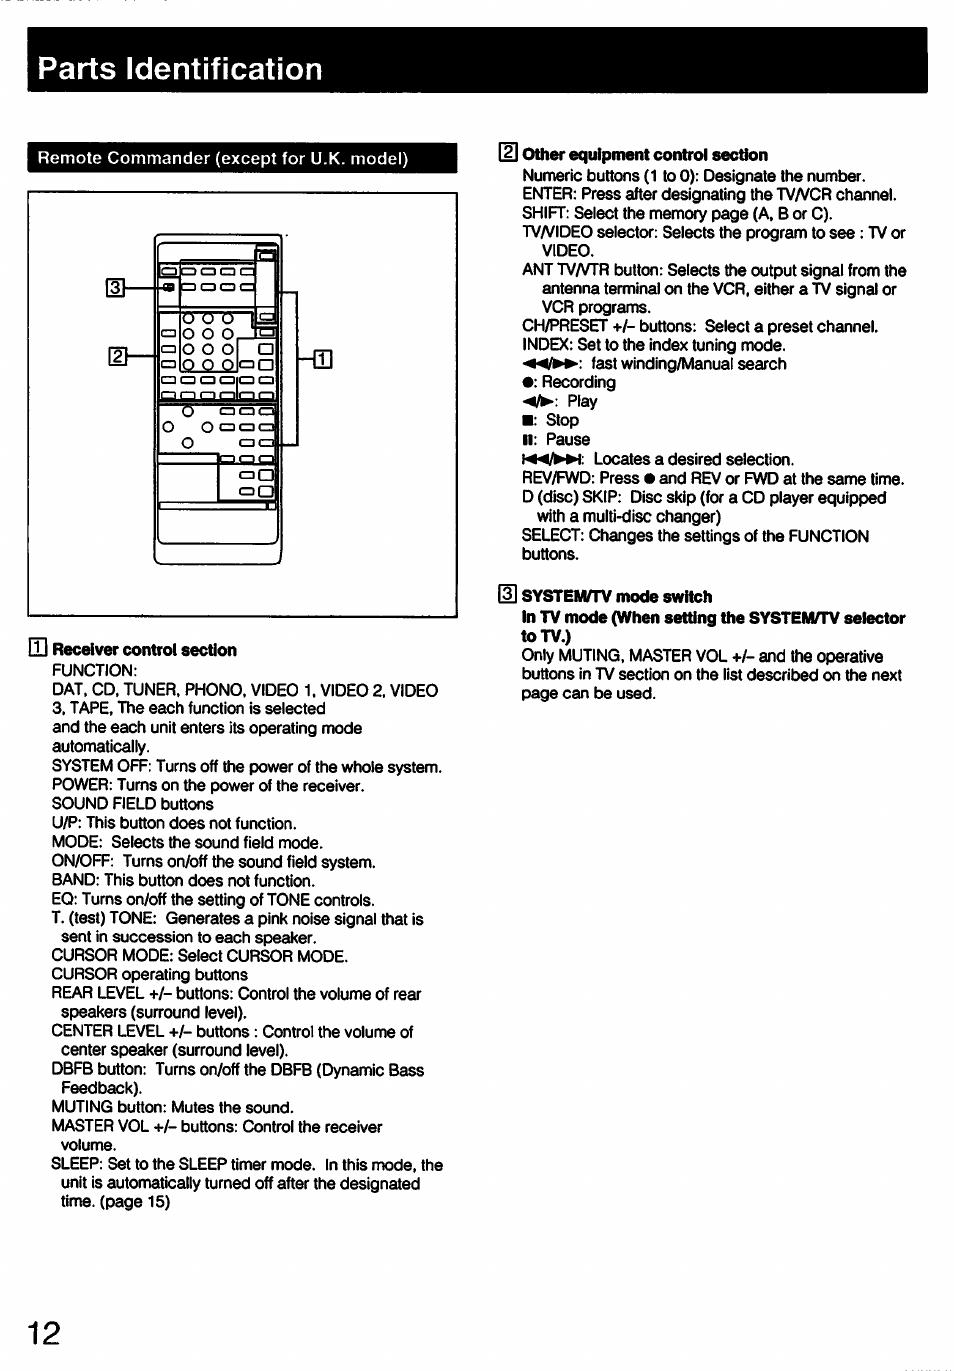 Parts identification, Qd receiver control section, D